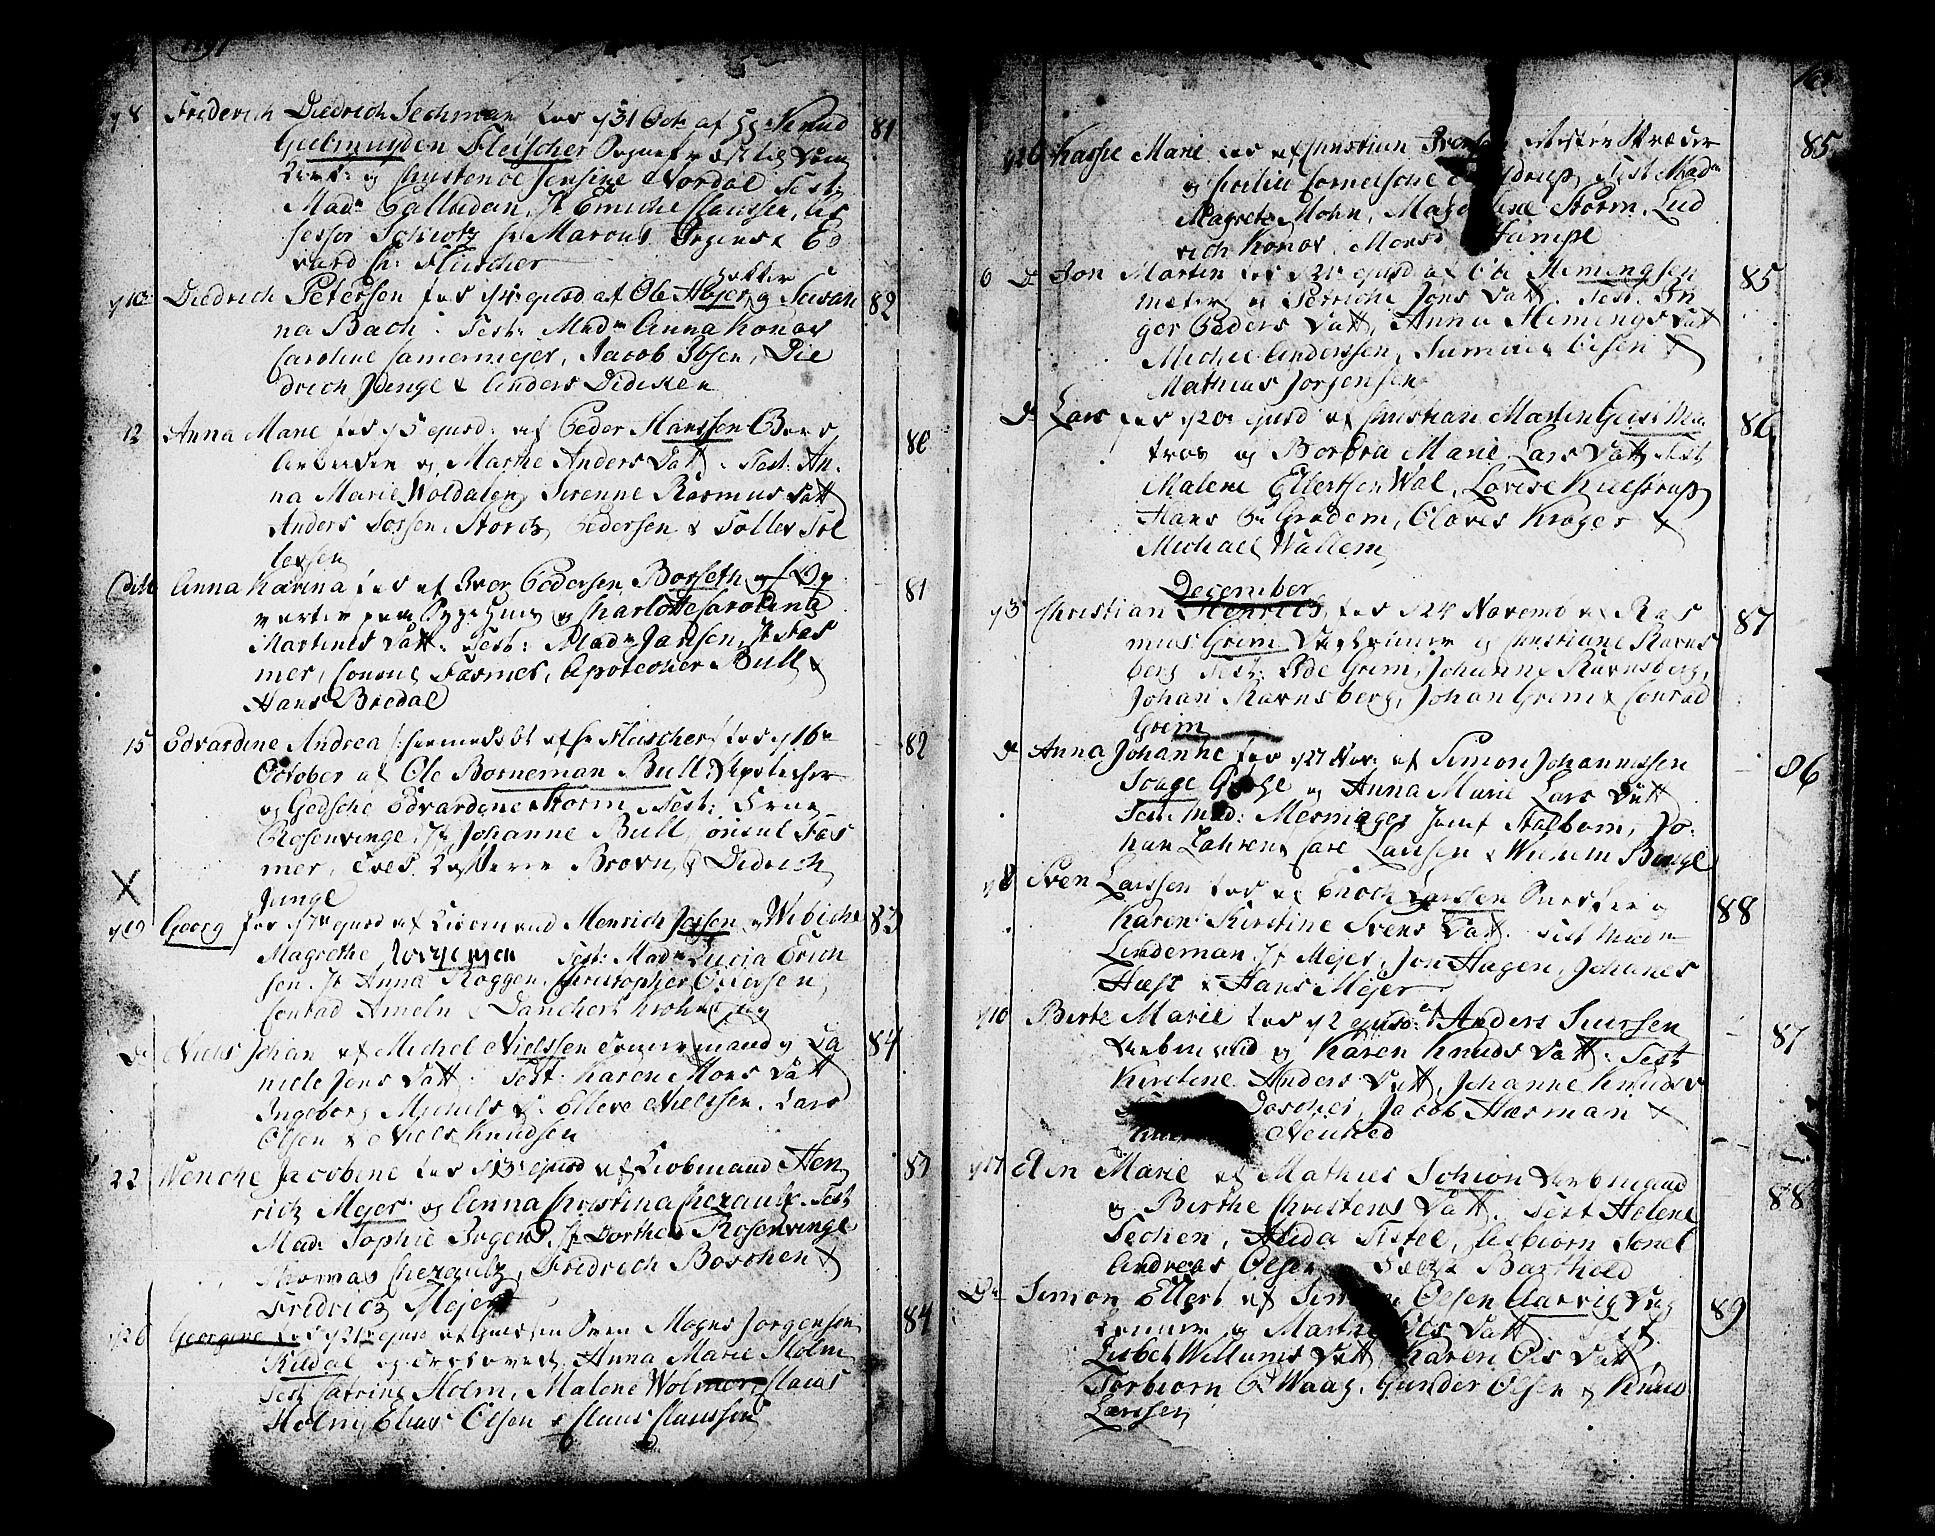 SAB, Domkirken sokneprestembete, H/Haa/L0004: Ministerialbok nr. A 4, 1763-1820, s. 162-163